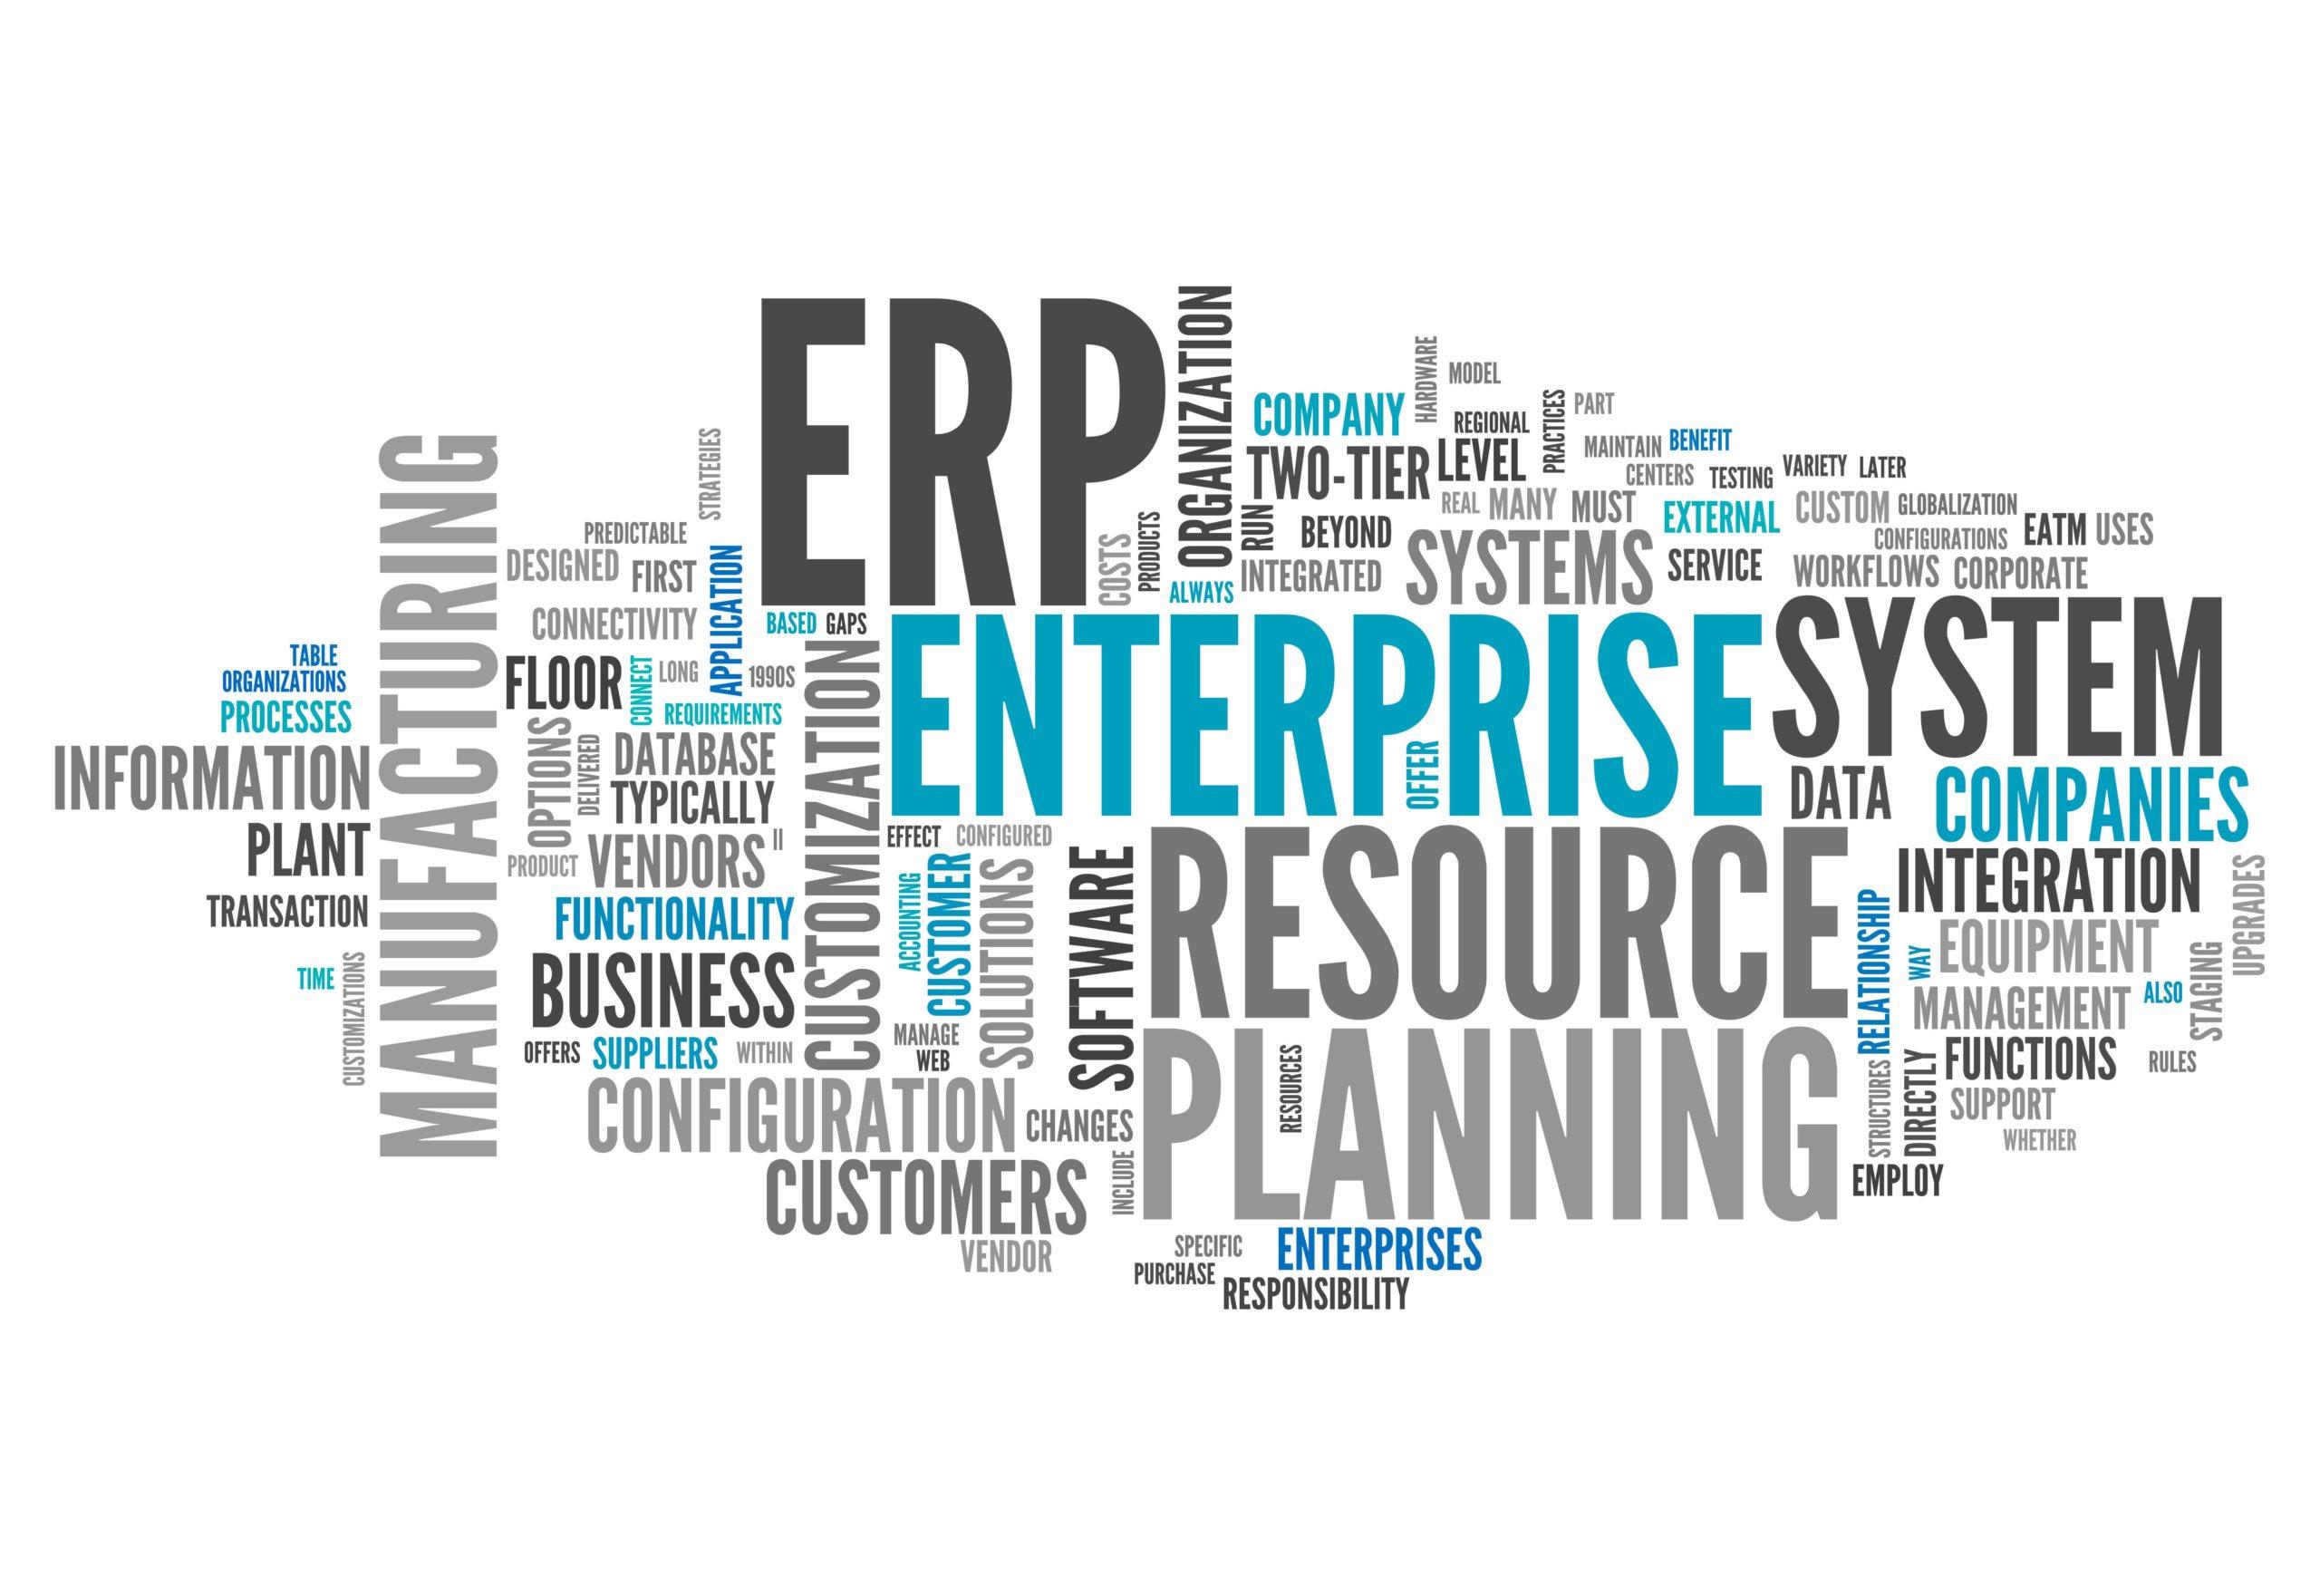 5 Benefits of an ERP (Enterprise Resource Planning) System